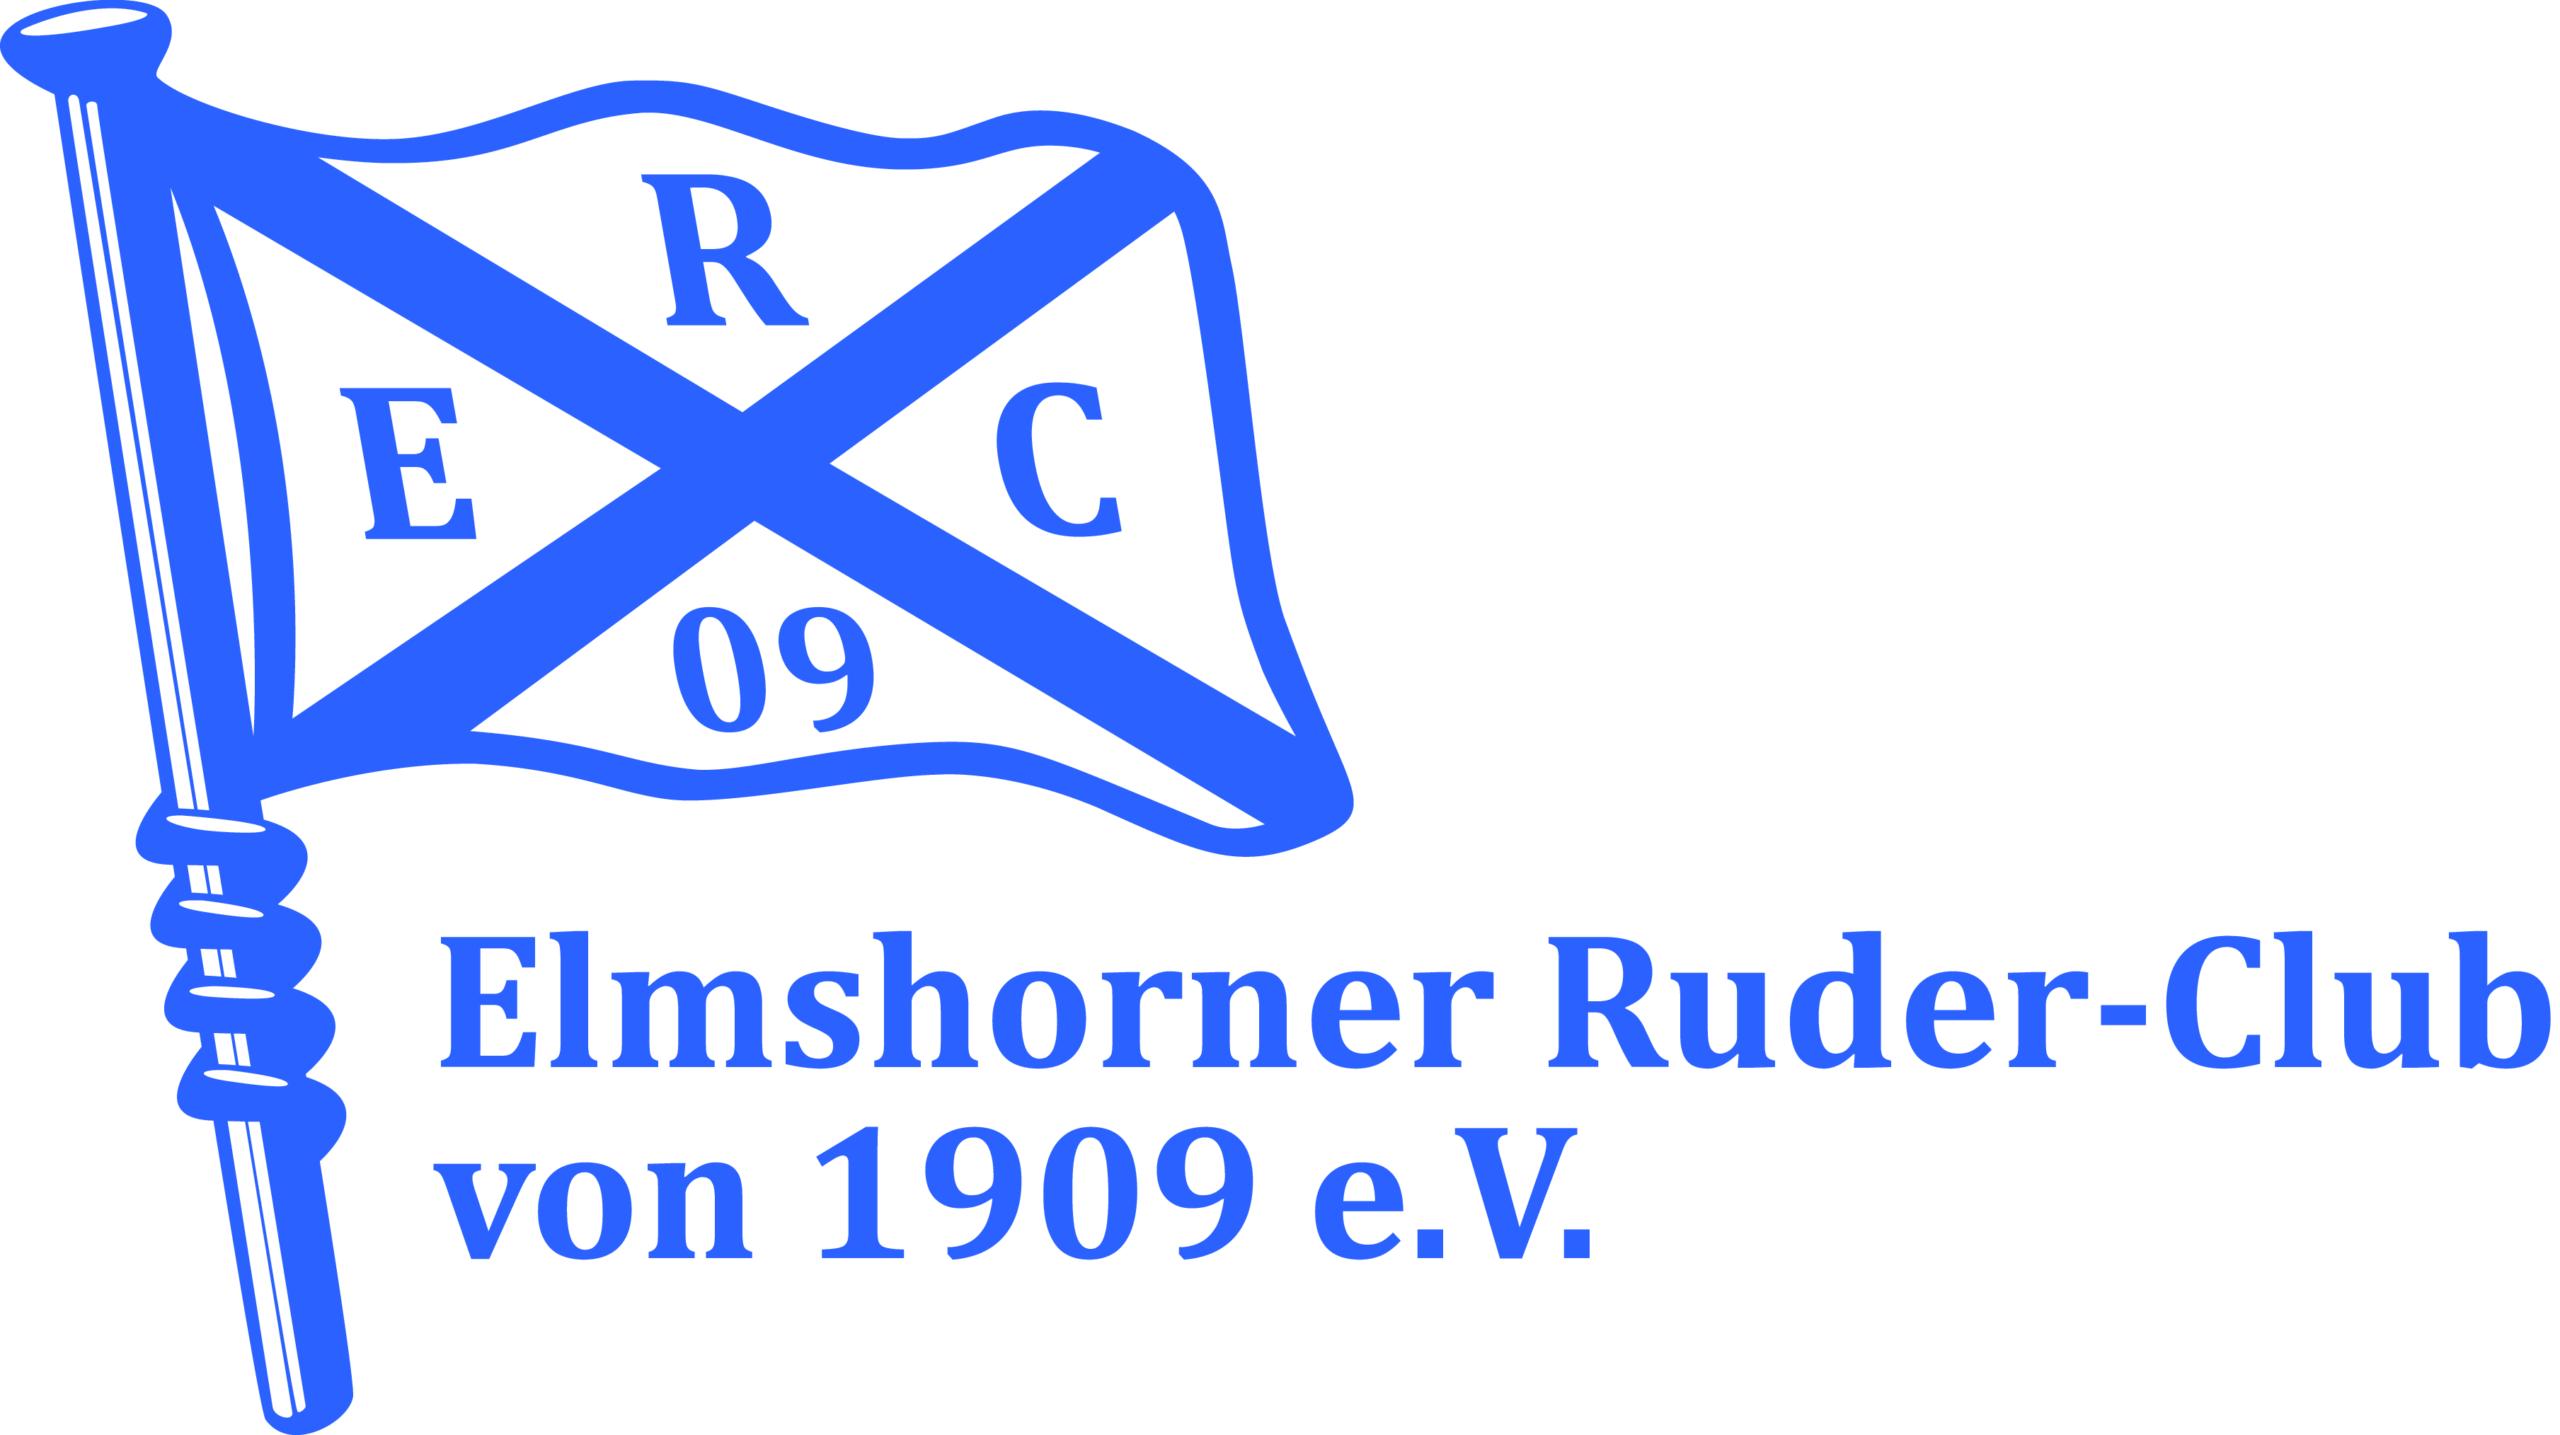 Elmshorner Ruder-Club v. 1909